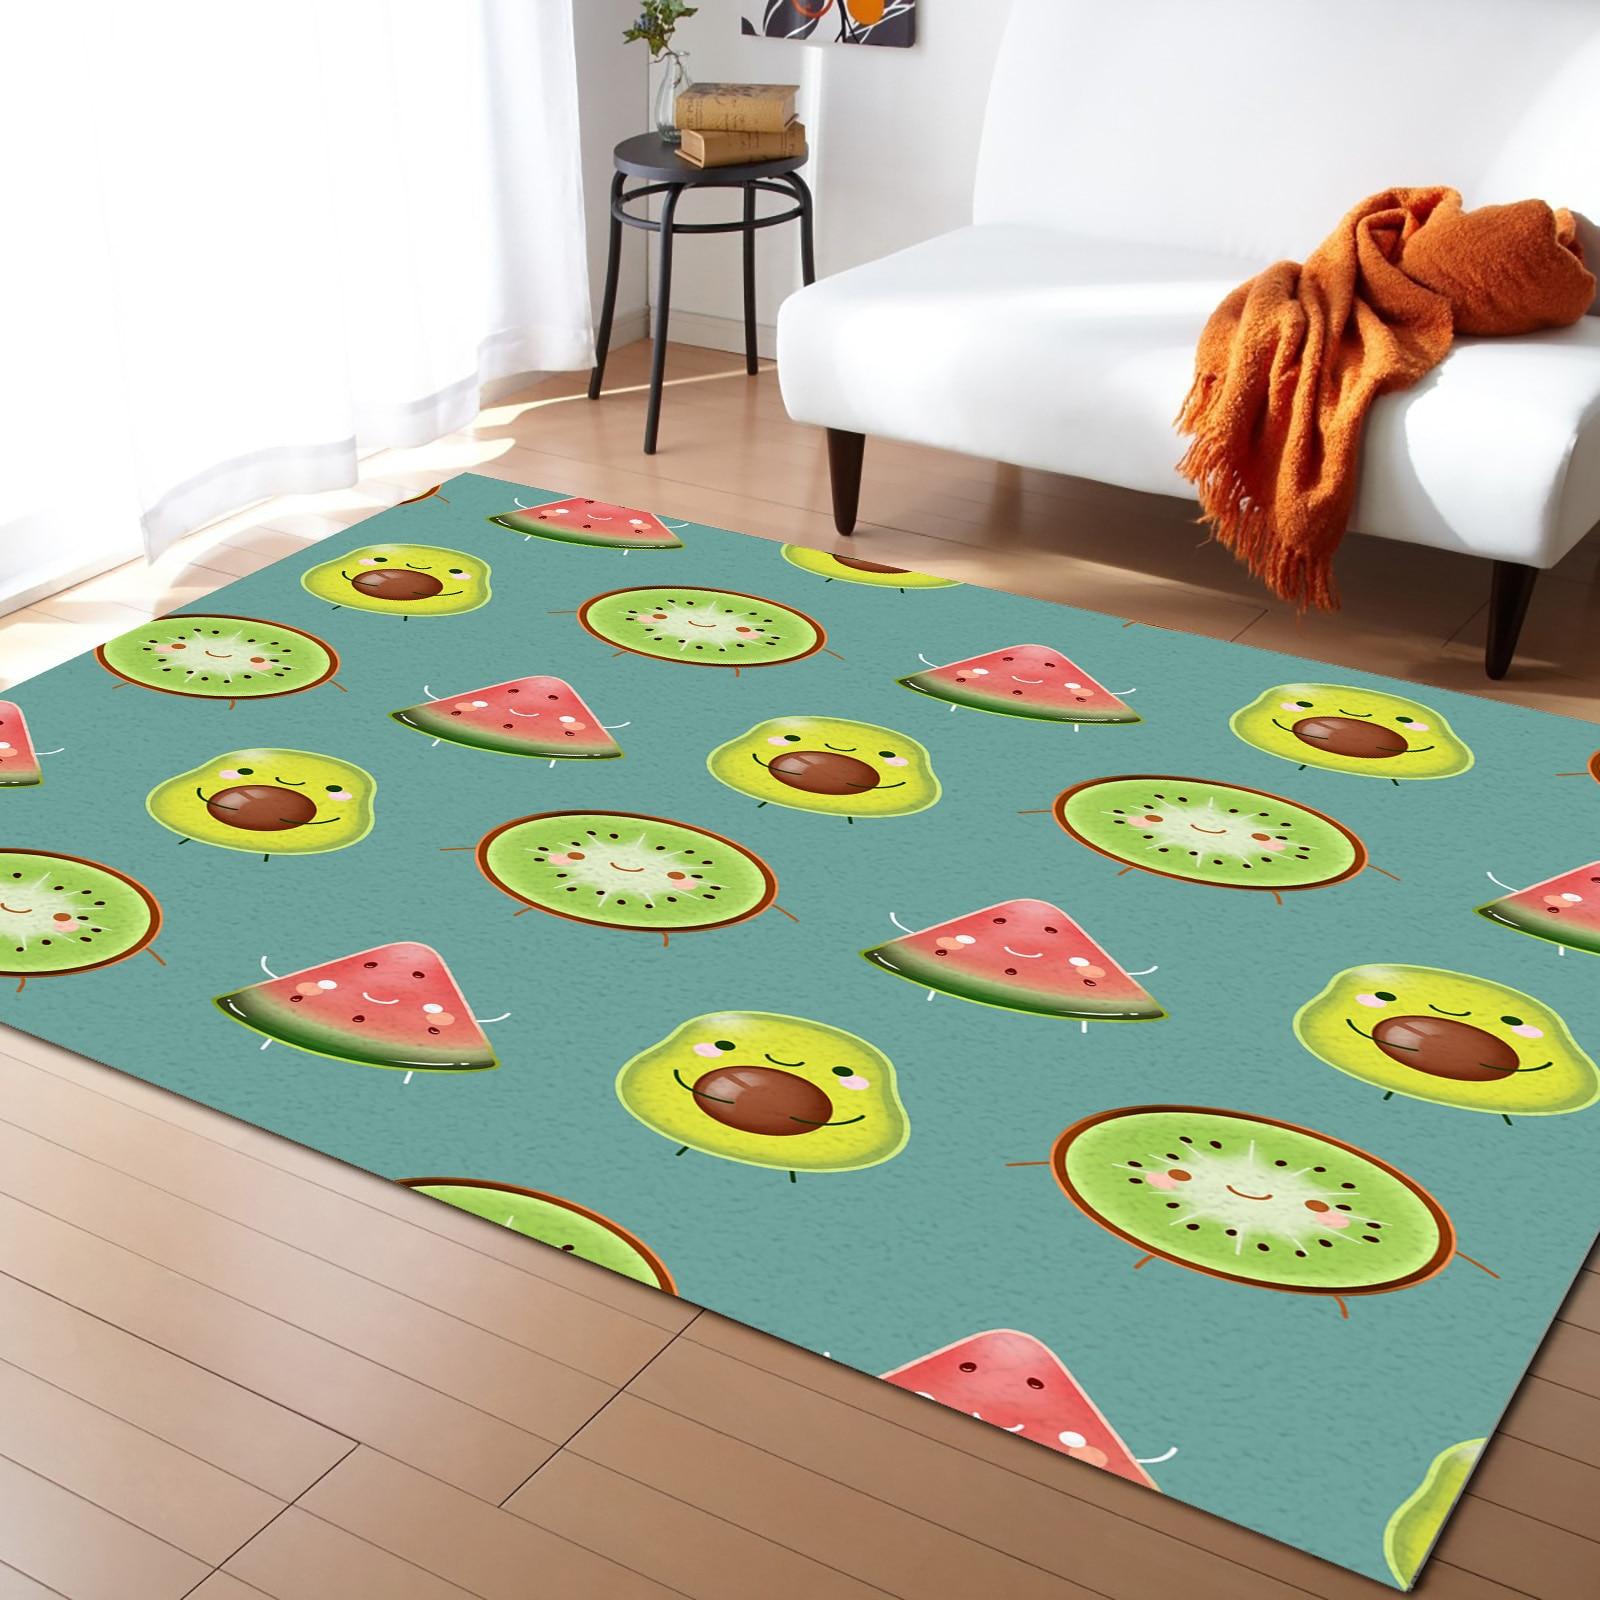 Kawaii الفواكه السجاد لغرفة المعيشة غرفة نوم الاطفال السرير السجاد لينة السجاد أريكة المنزل ديكور للطاولات حصيرة